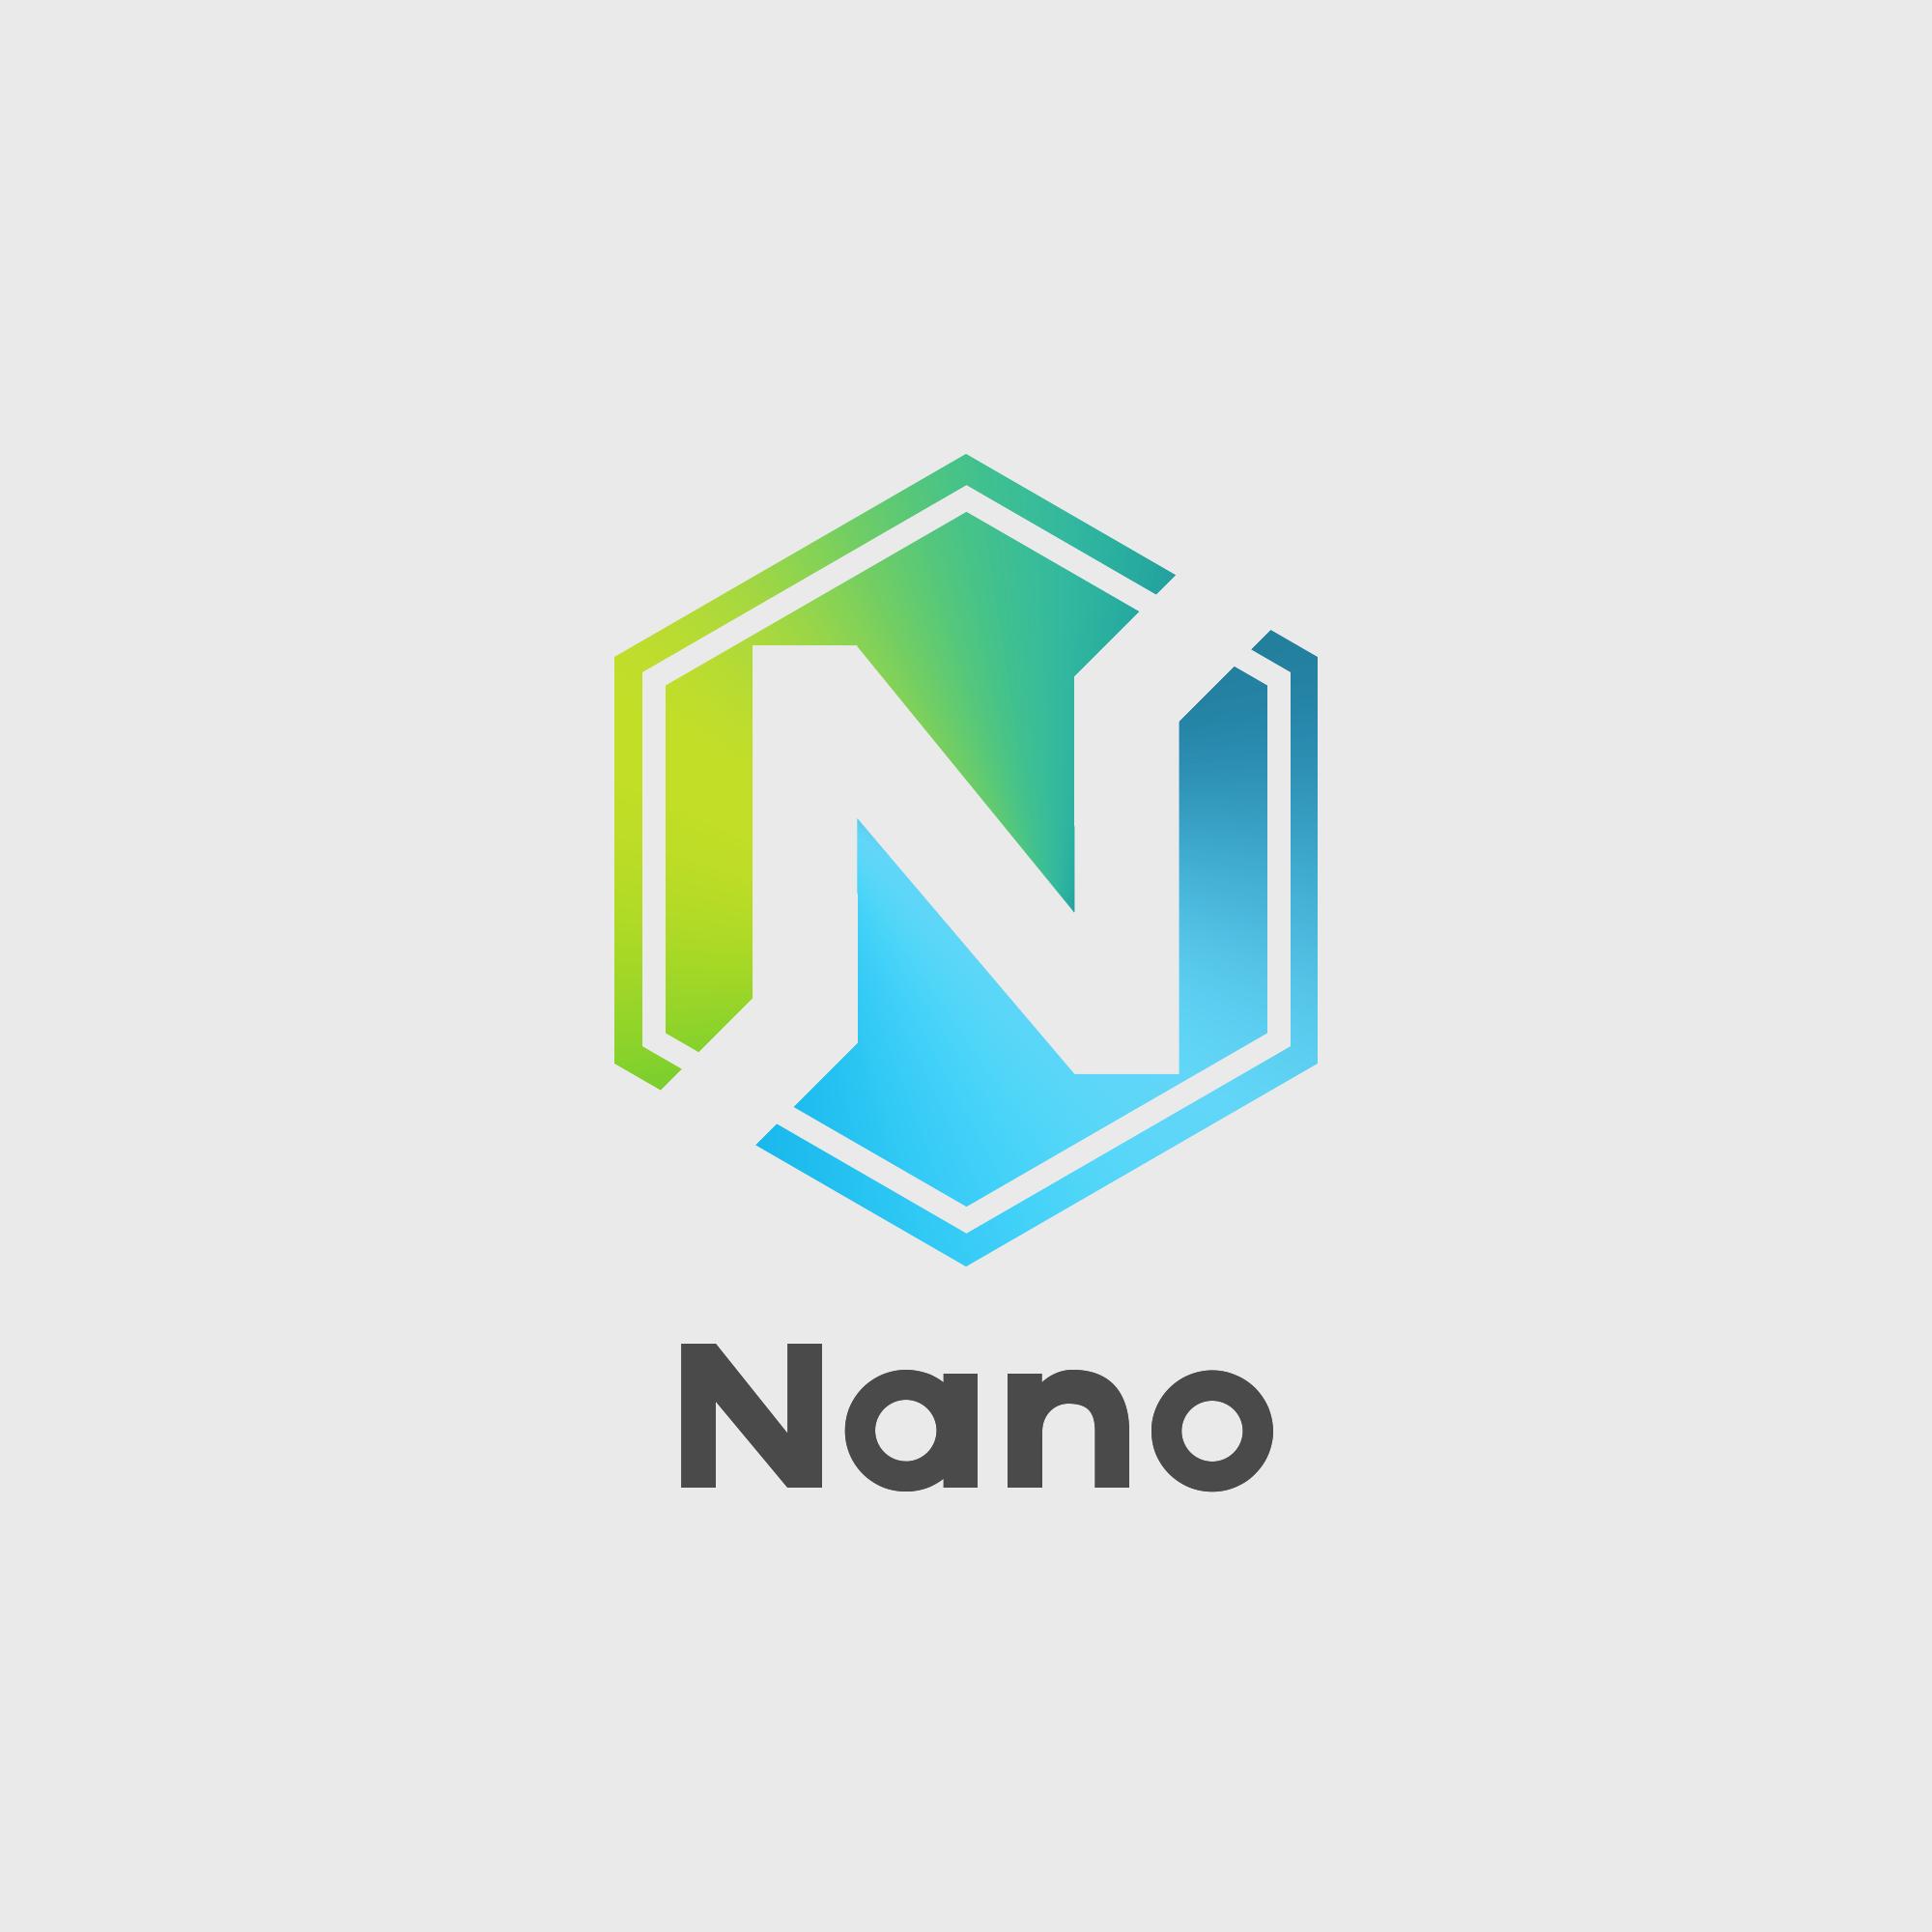 Nano logo concept : RaiBlocks.